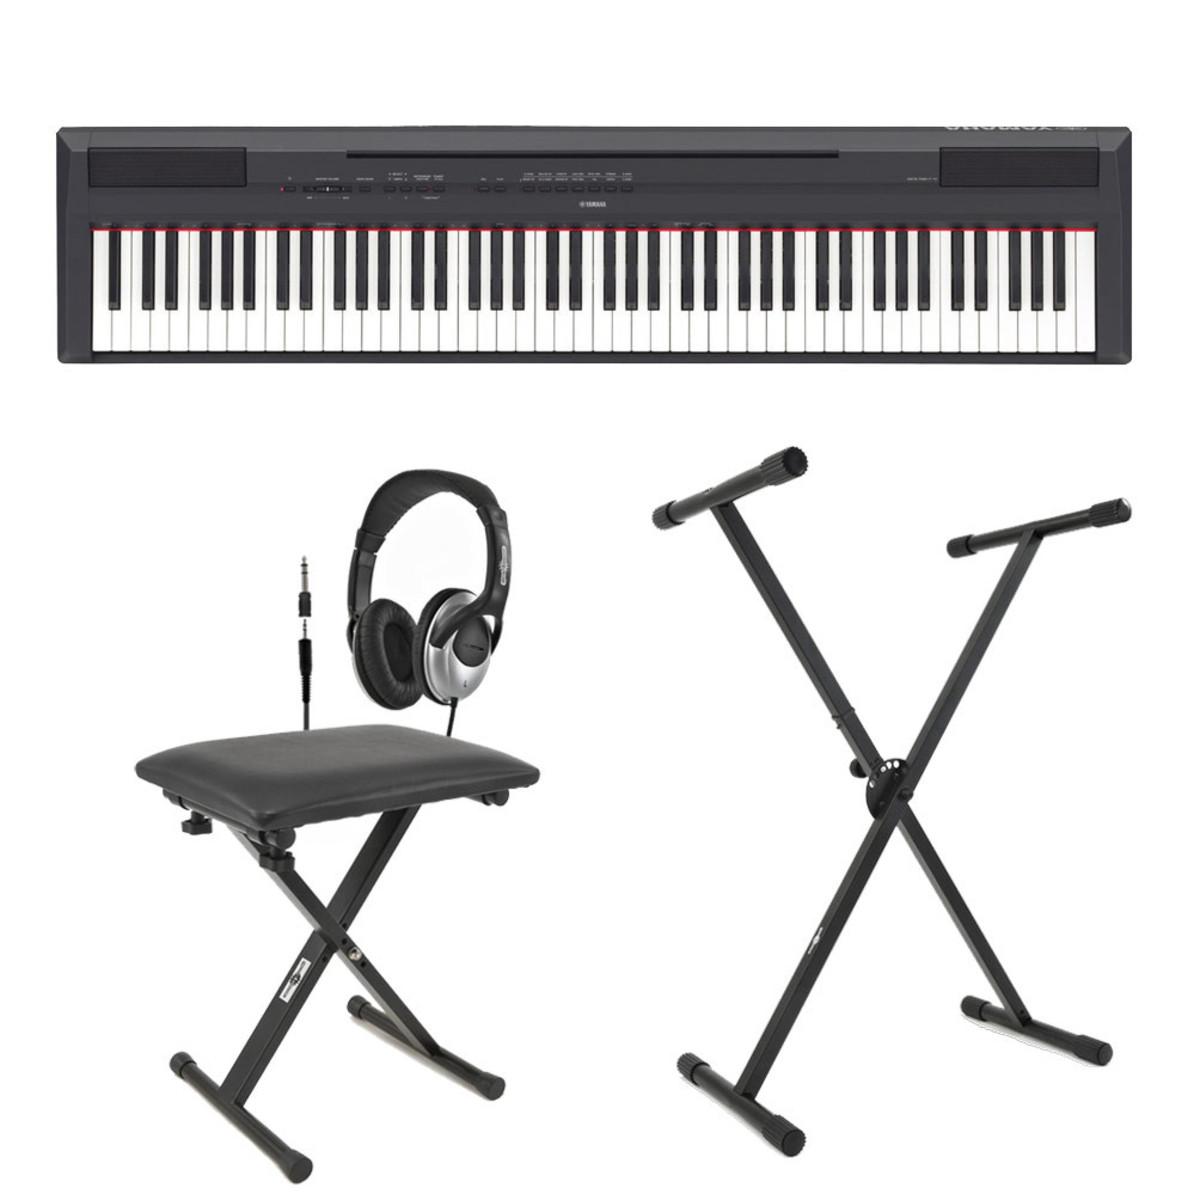 Yamaha p115 digital piano black inc stand bench and for Yamaha p115 piano